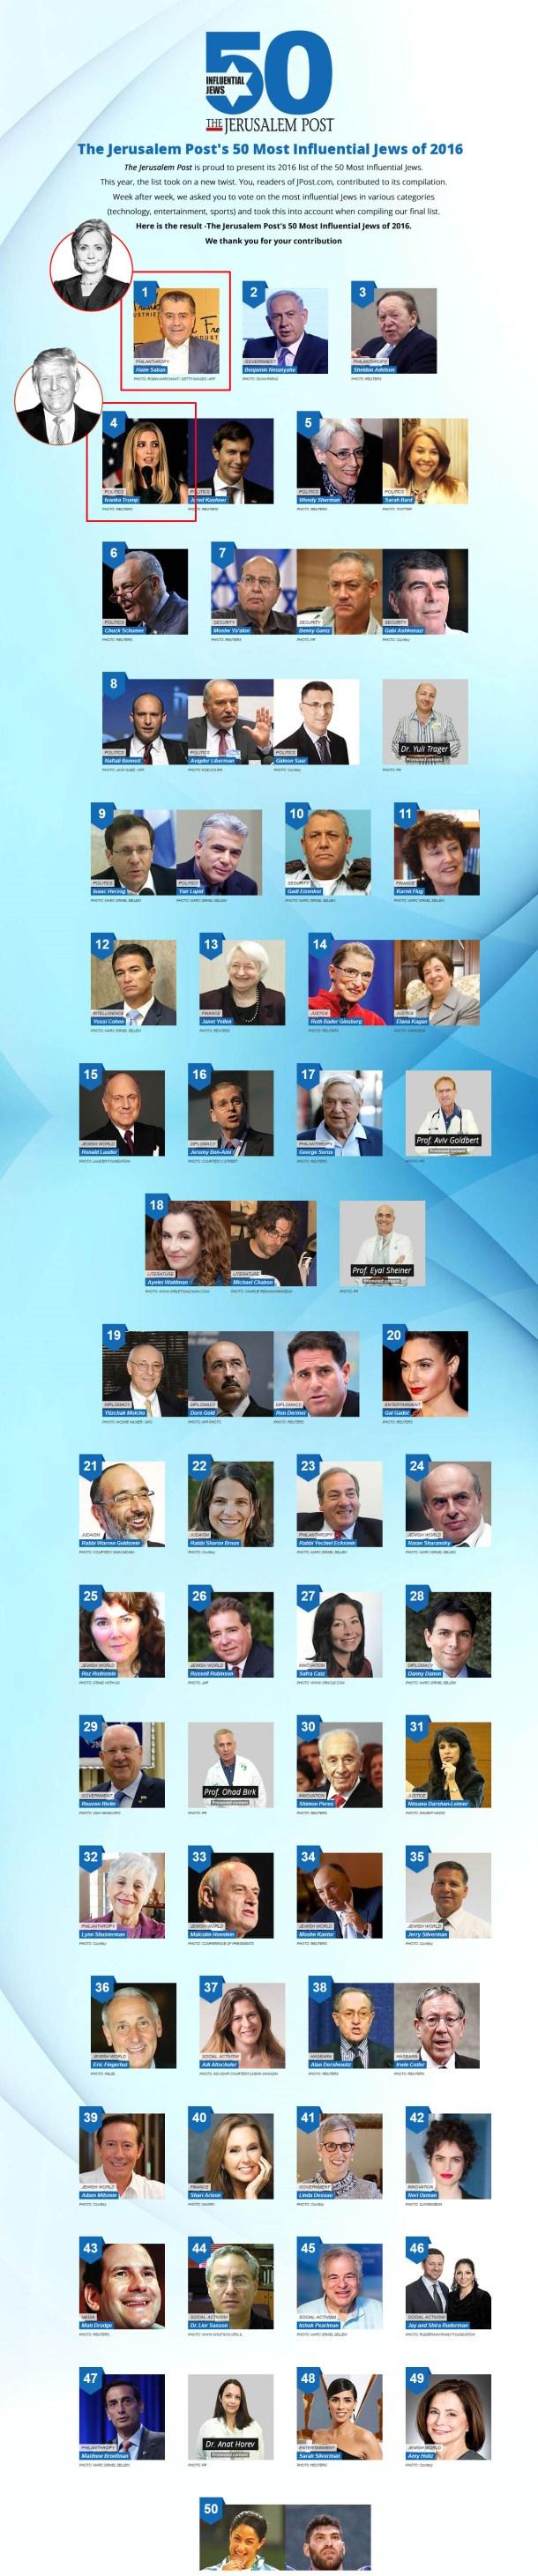 50 Influencers 2016 2016-10-05 00-43-43